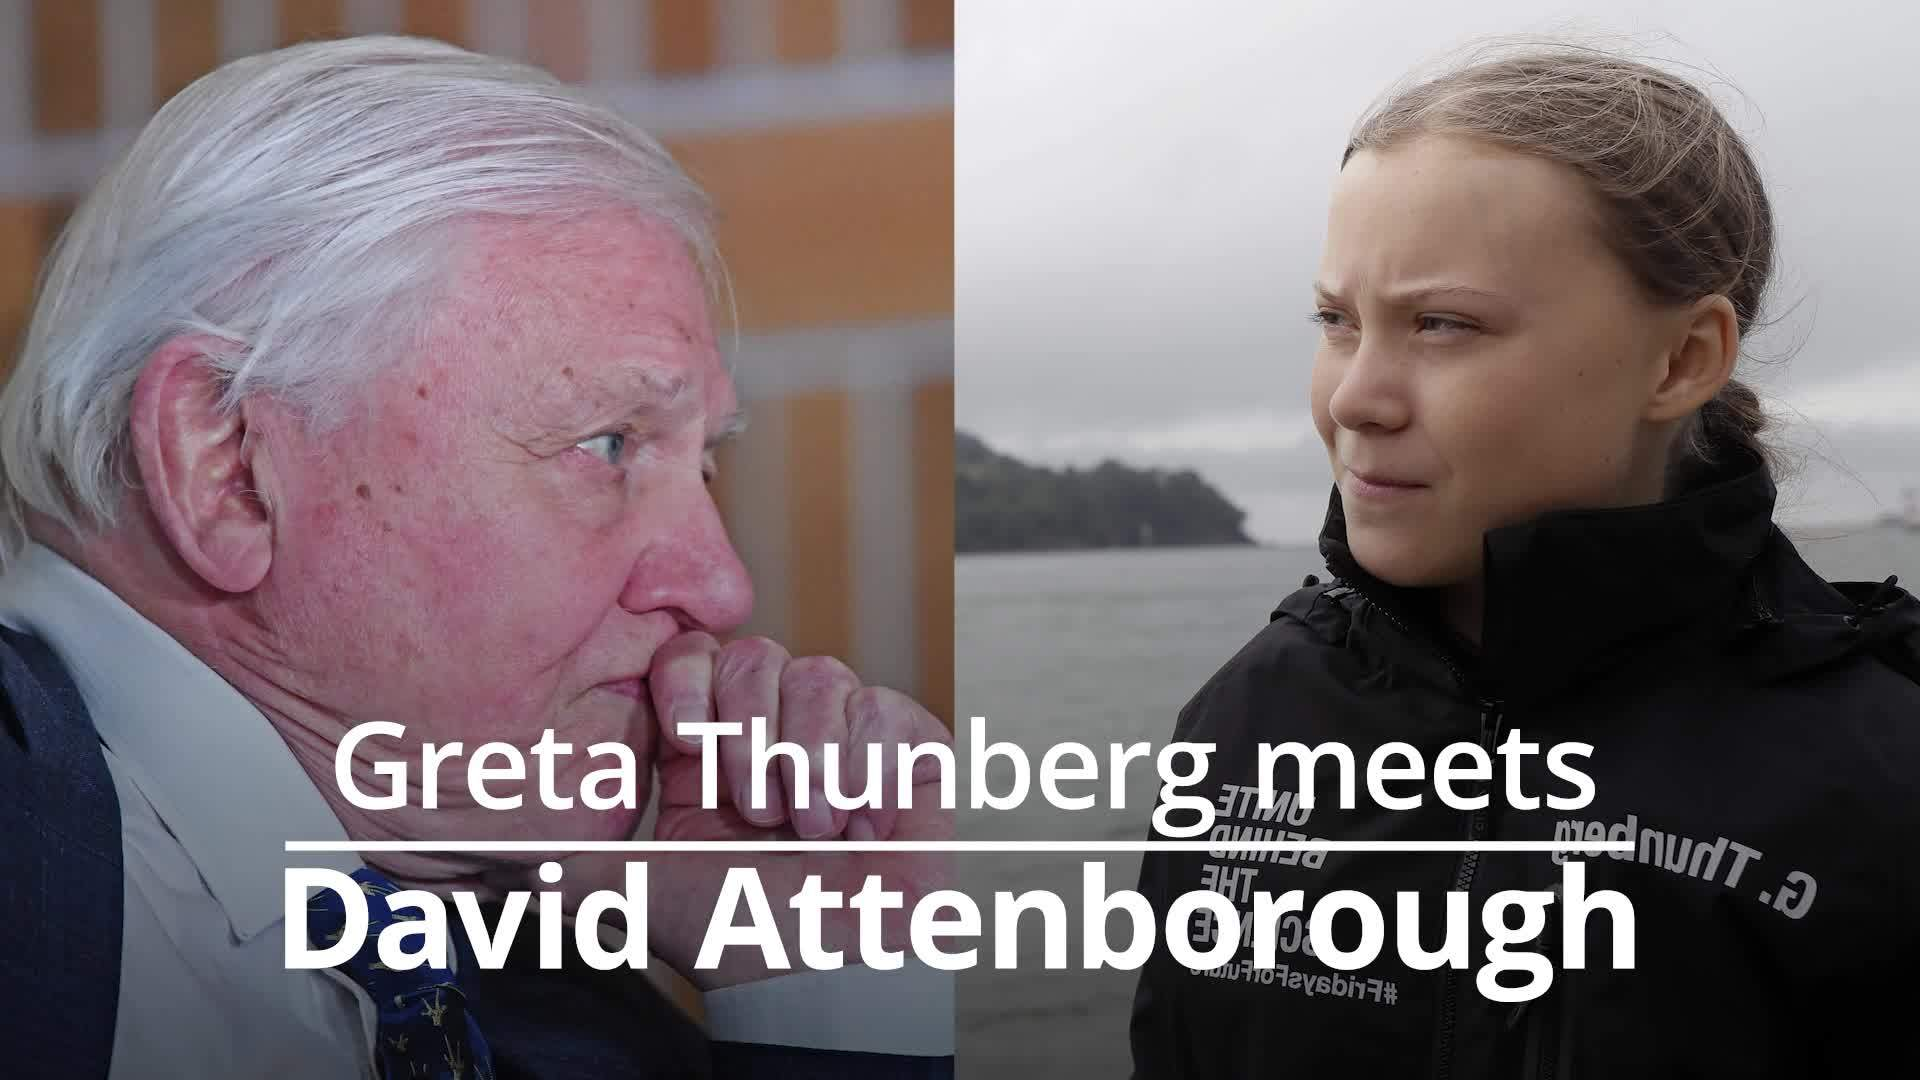 Greta Thunberg meets David Attenborough on Skype